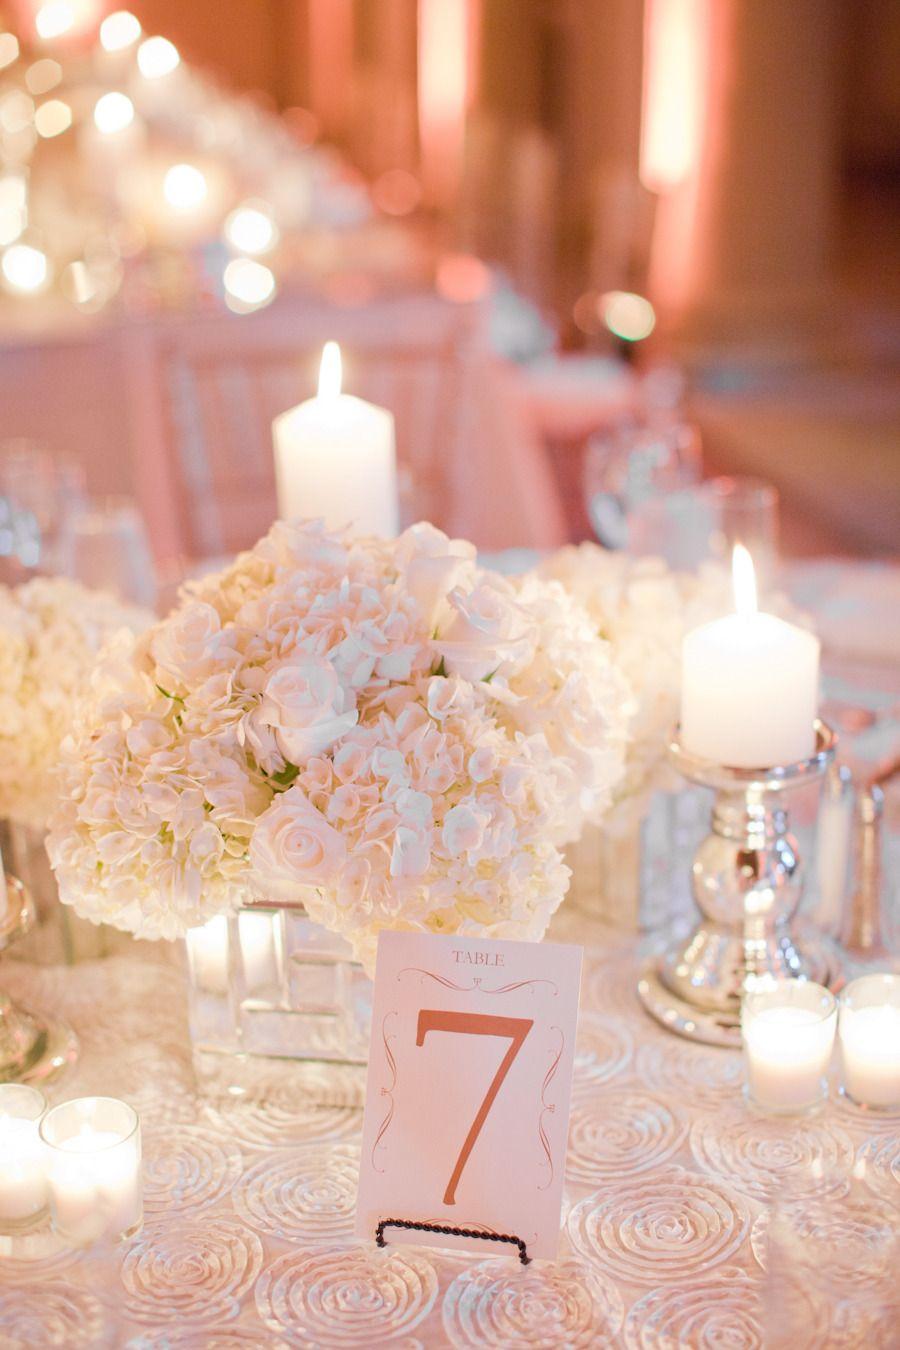 Biltmore Hotel Wedding By Michelle March Wedding Centerpieces Wedding Decorations Wedding Table